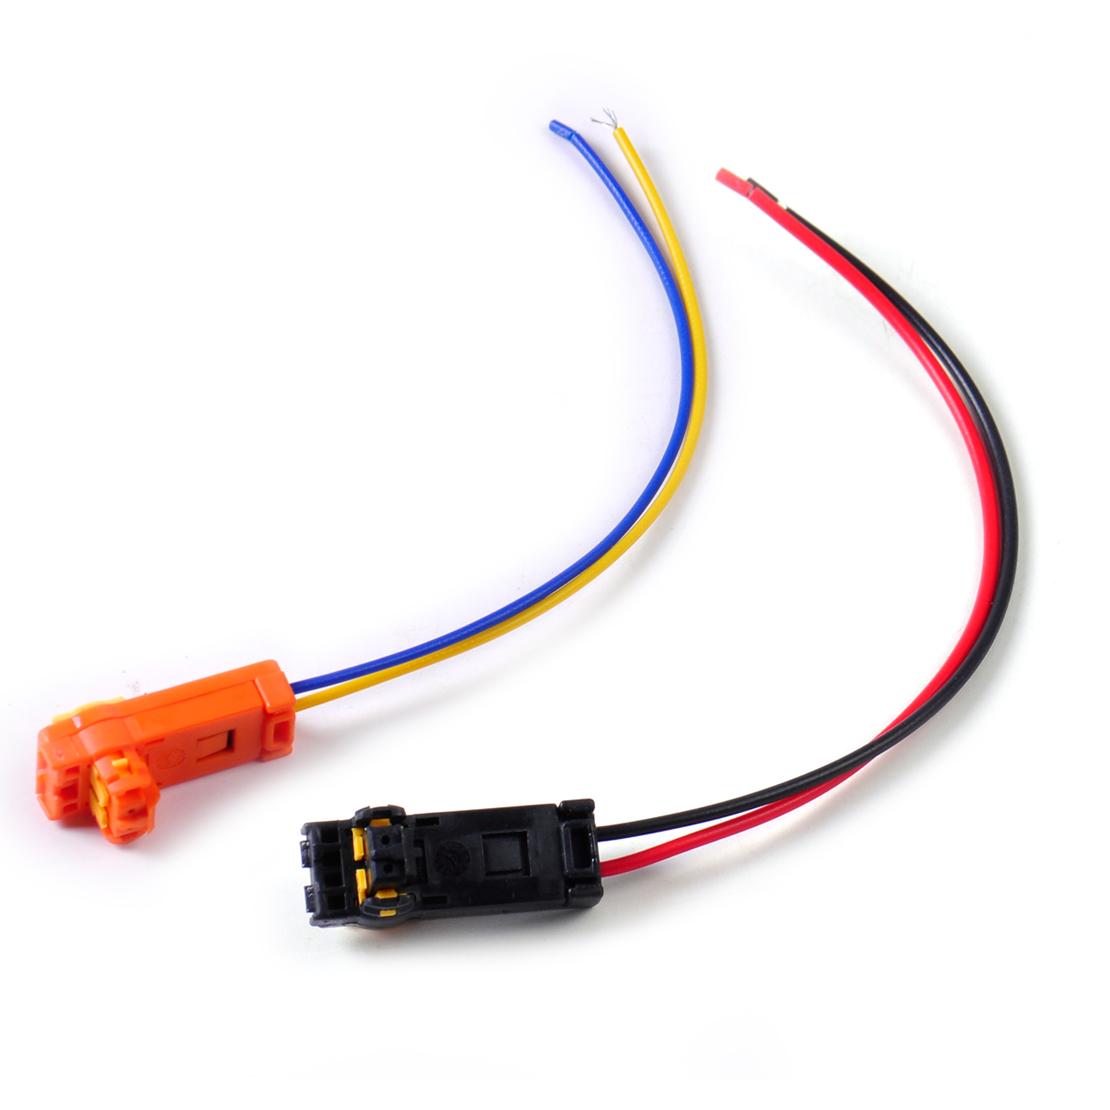 [DIAGRAM_09CH]  2pcs For VW Toyota Nissan Mazda Subaru Airbag Clockspring Wires Connector  Plugs ushirika.coop | Vw Air Bag Wiring |  | Tanzania Federation of Cooperatives